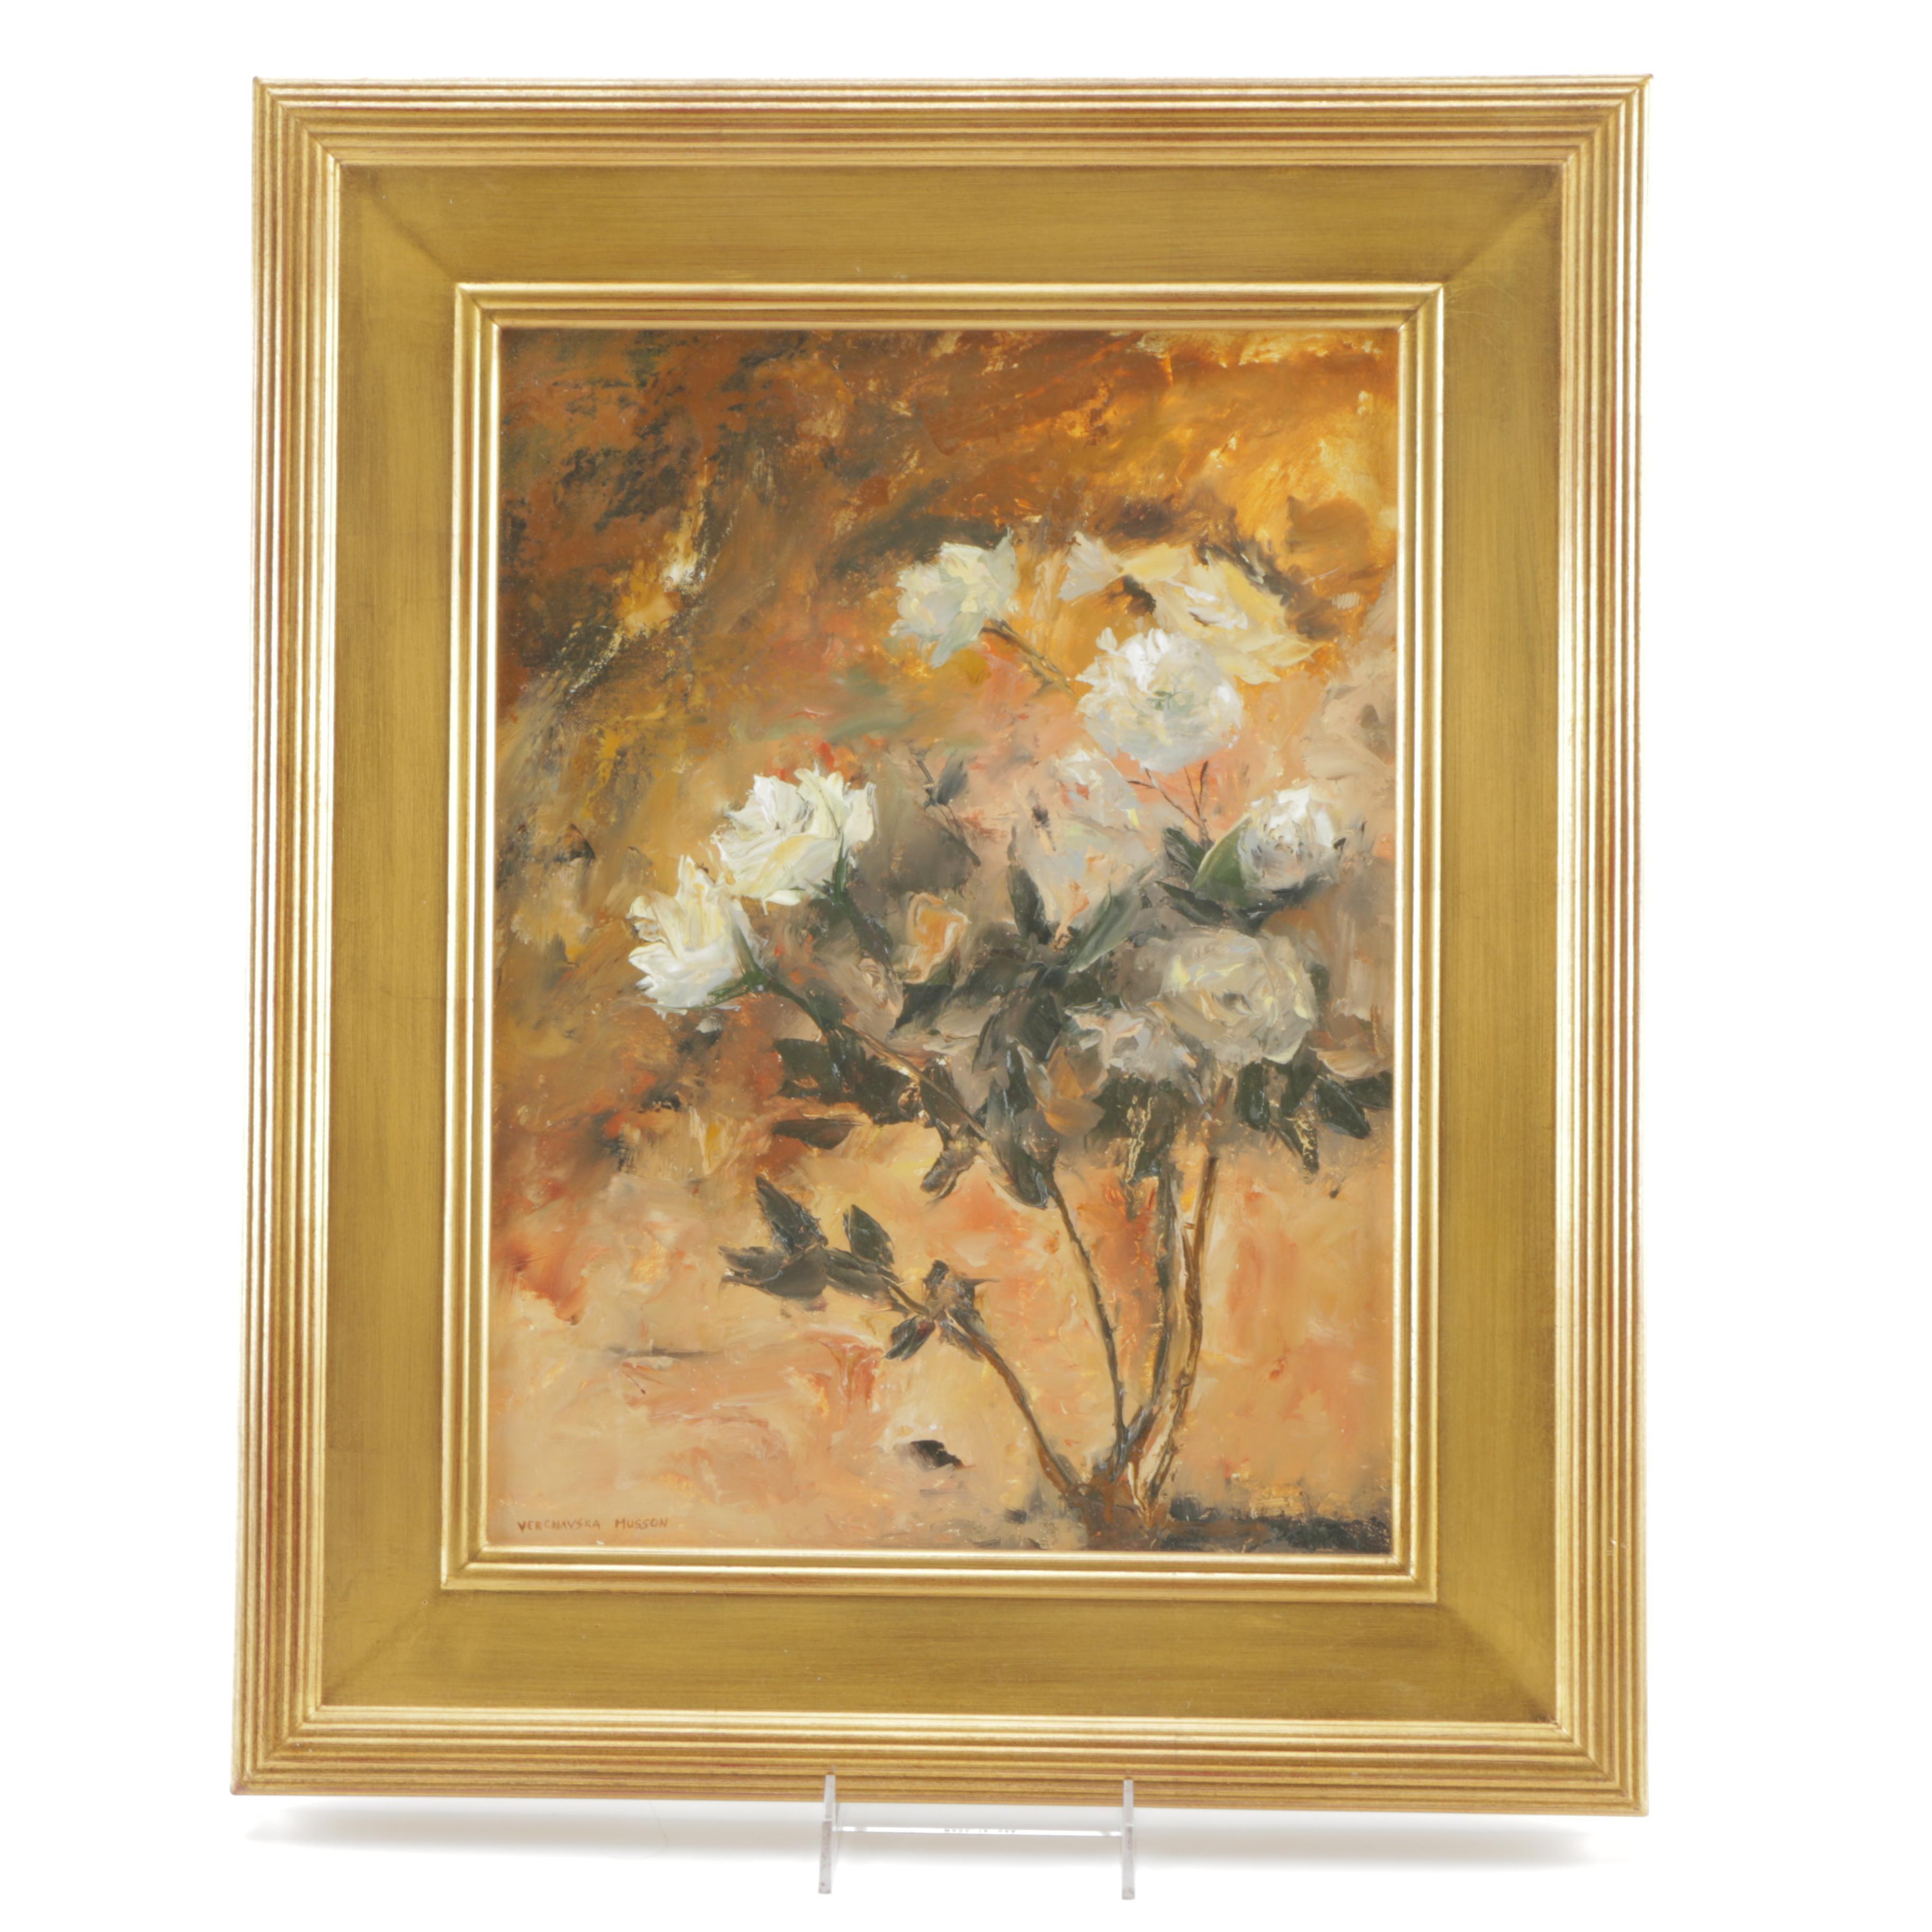 "Elisa Verchavska Musson Oil Painting on Canvas ""Sublime"""